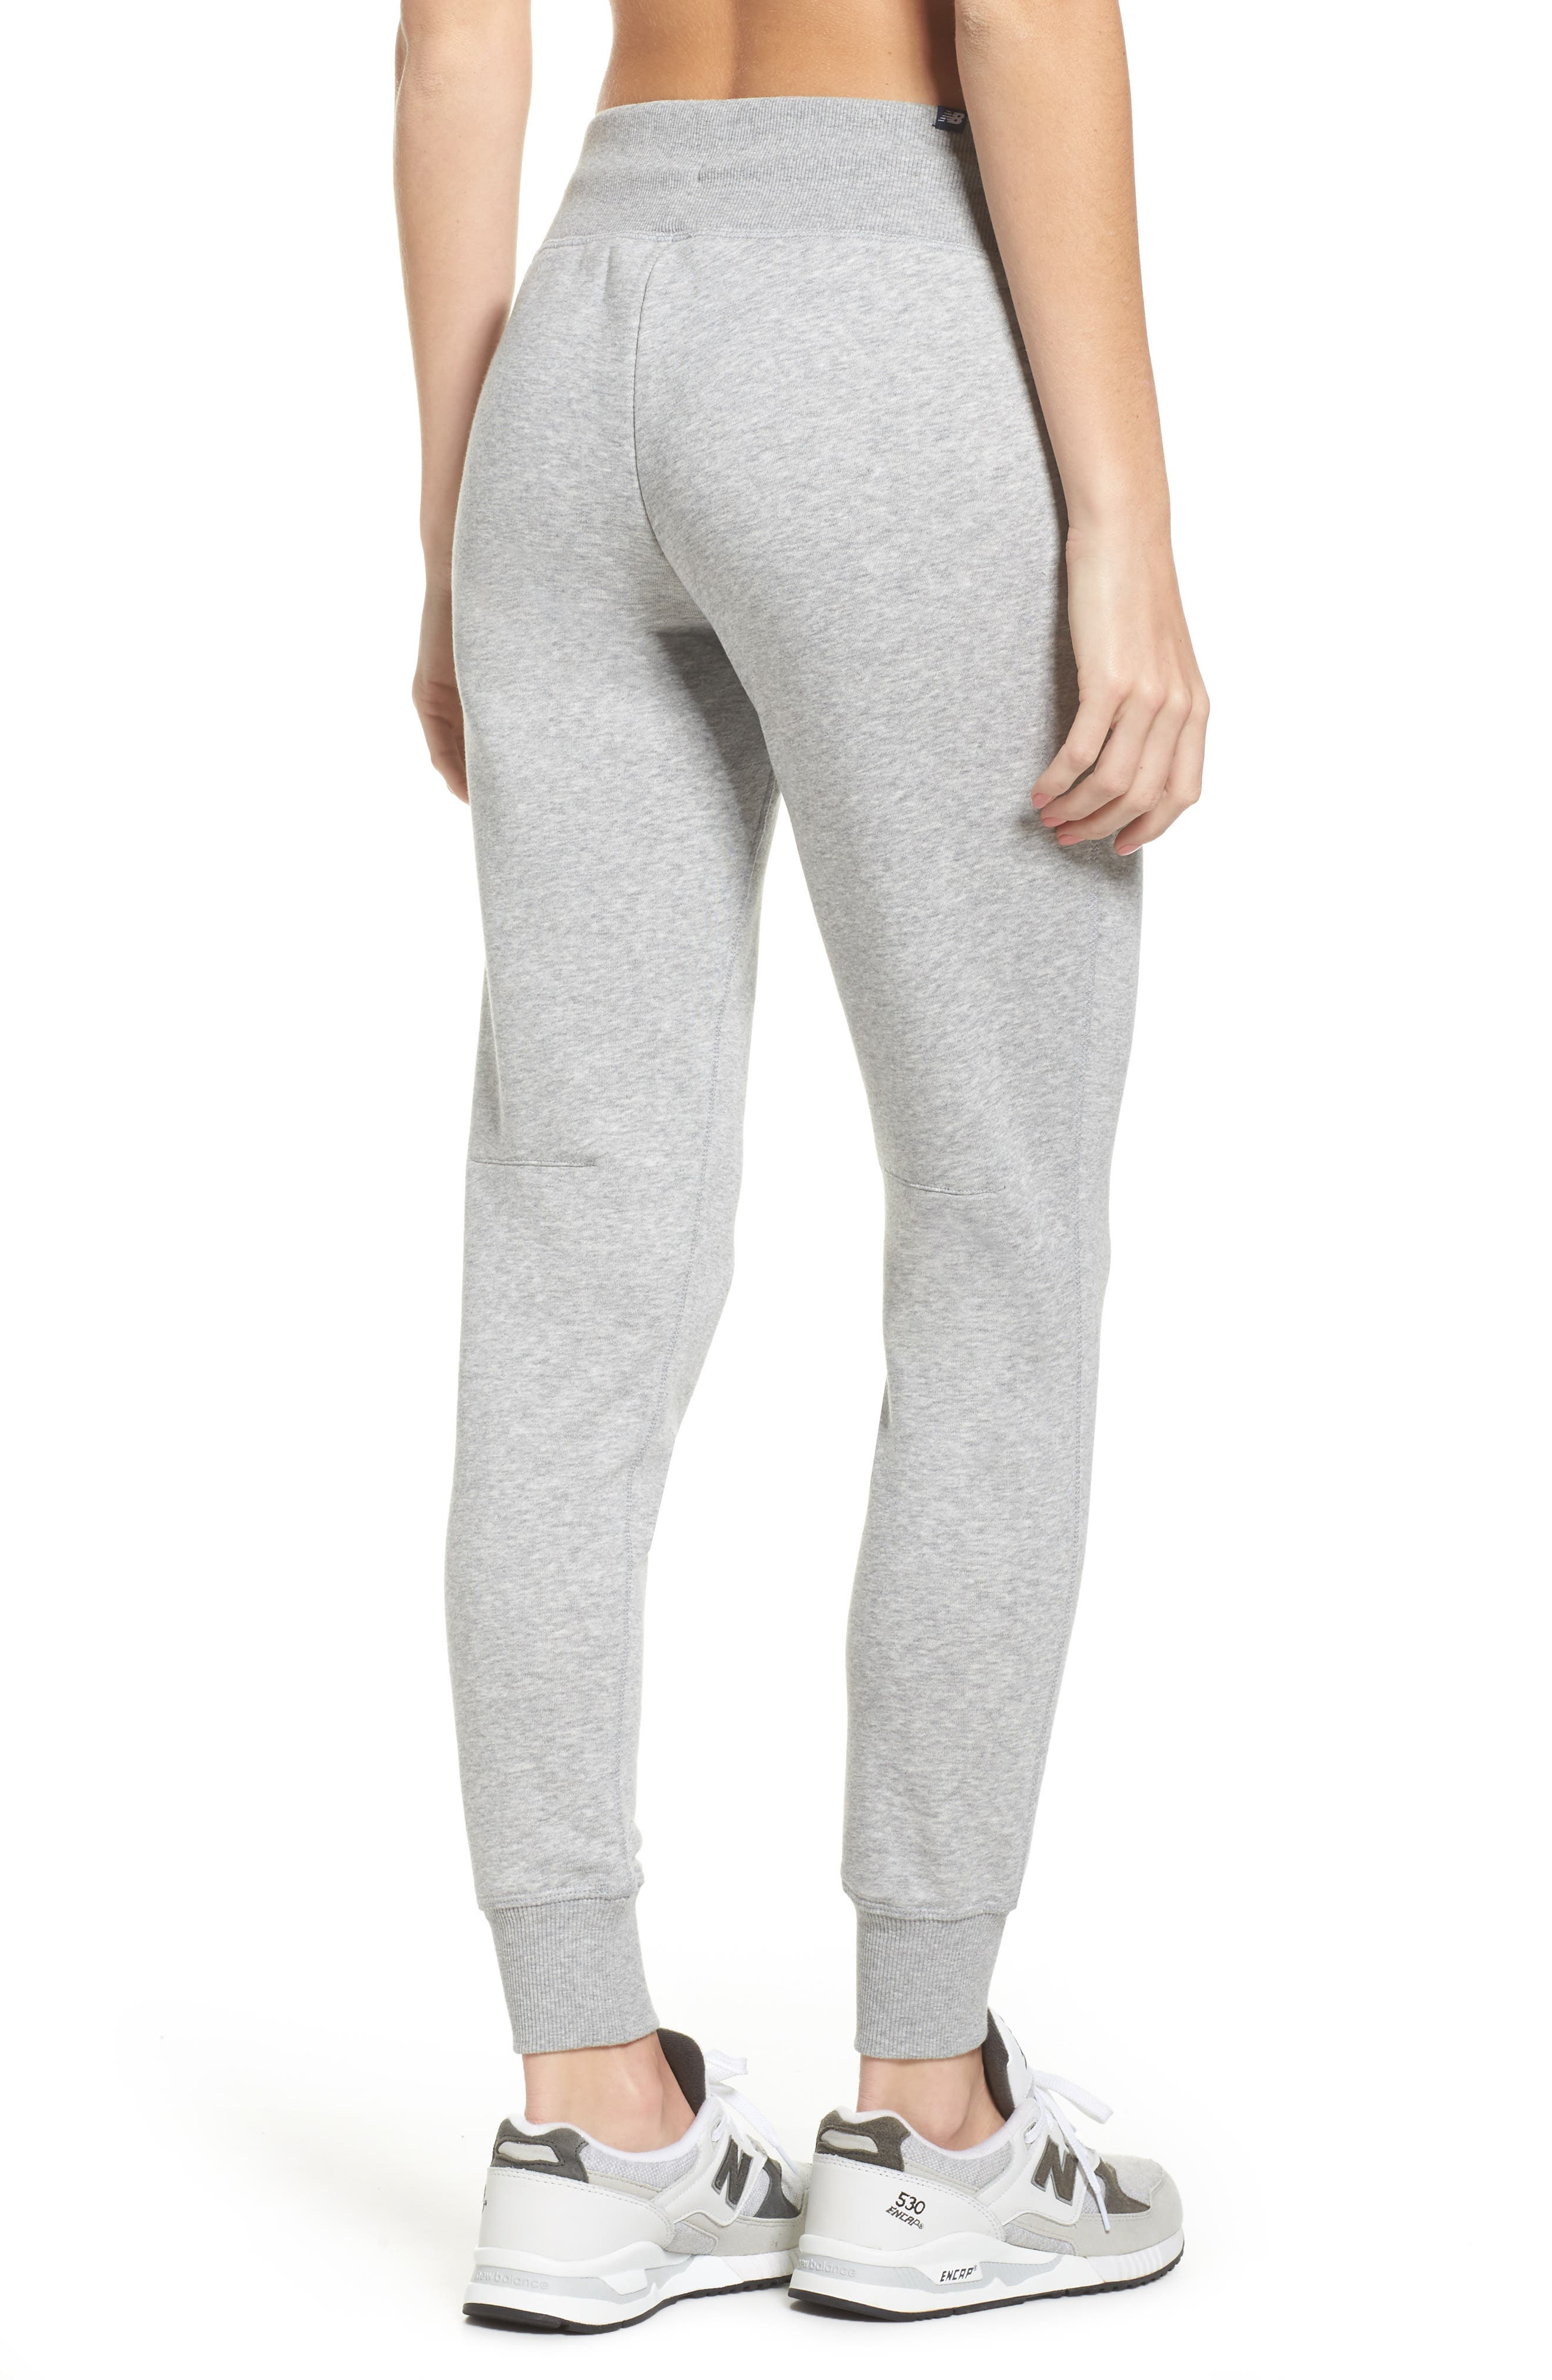 Essentials Sweatpants,                             Alternate thumbnail 2, color,                             Athletic Grey